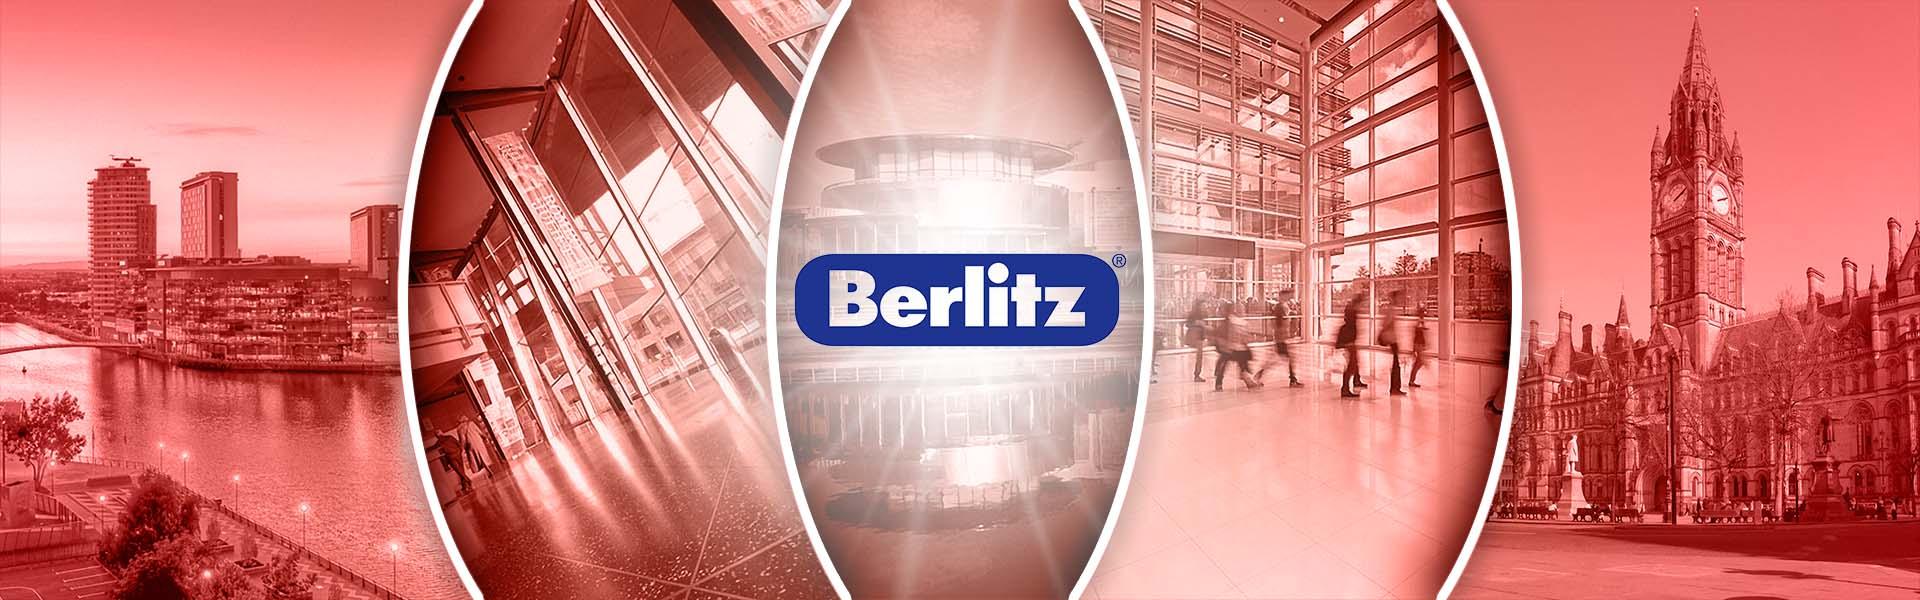 Berlitz Manchester Dil Okulu